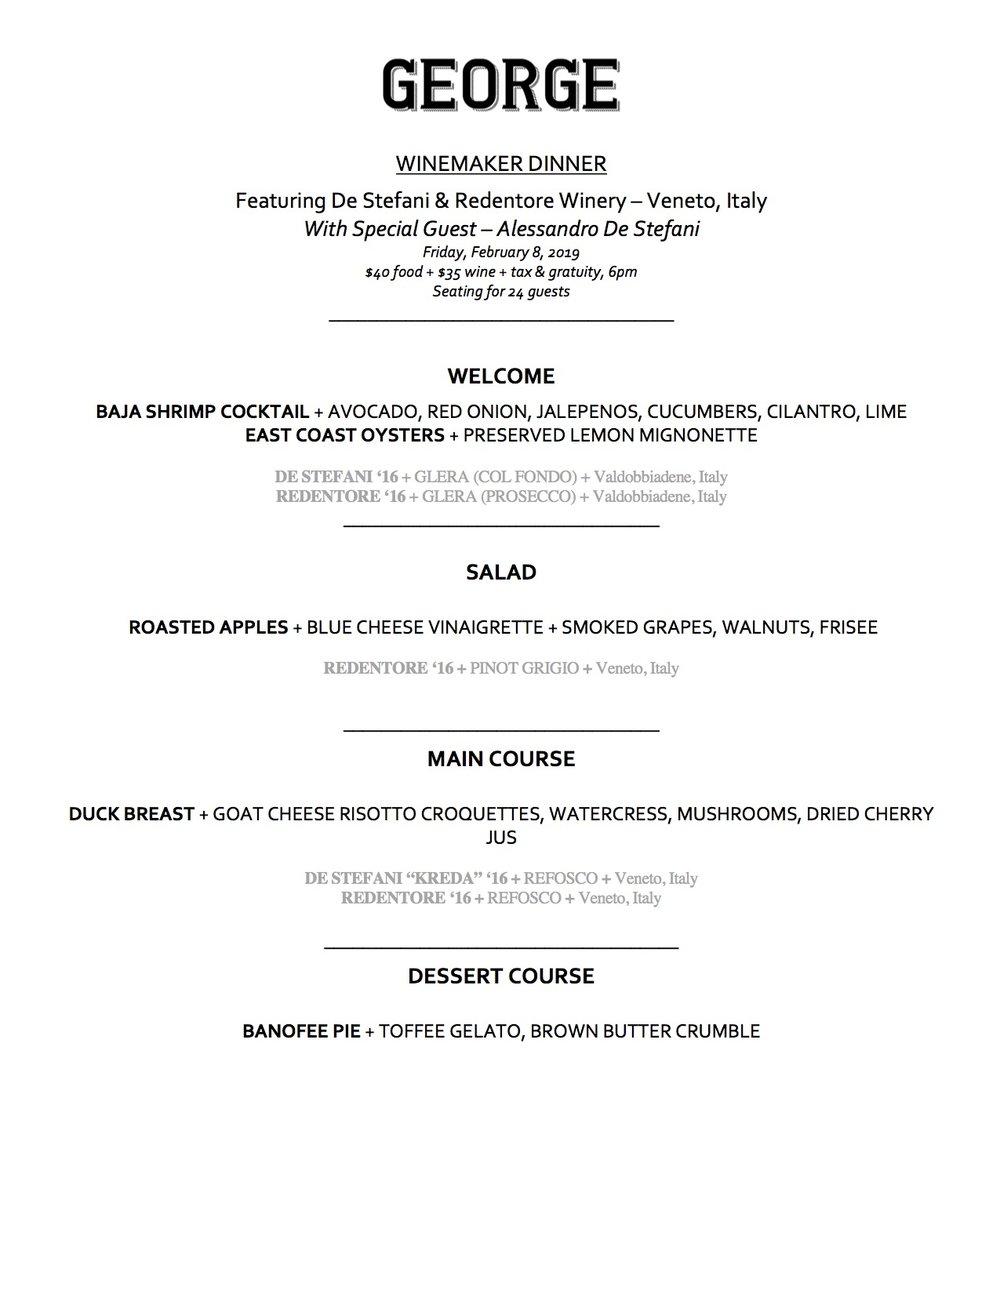 GEORGE + De Stefani Wine Dinner.jpg